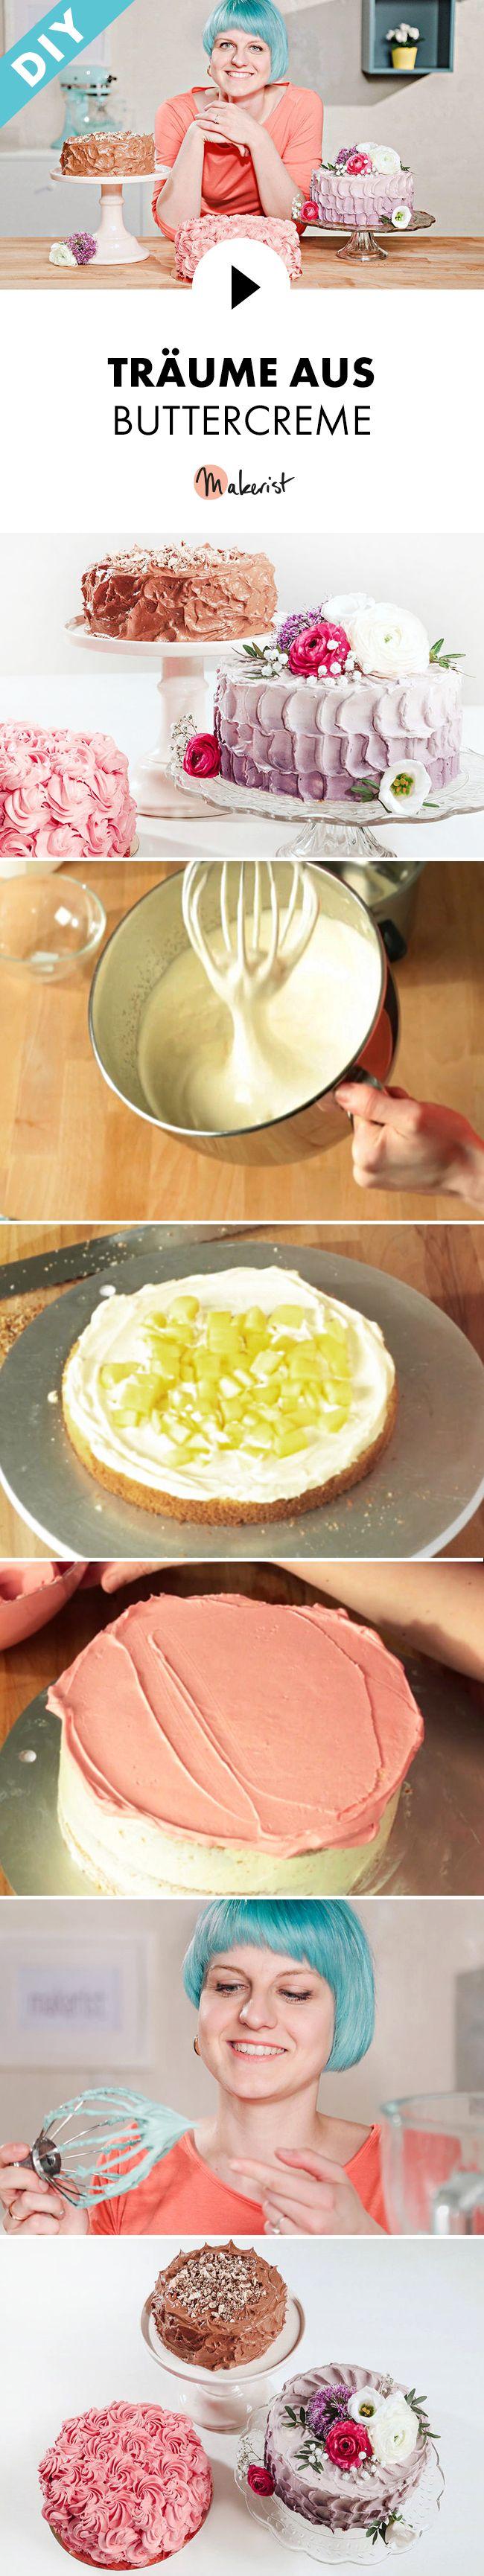 Petit beurre kuchen mit buttercreme